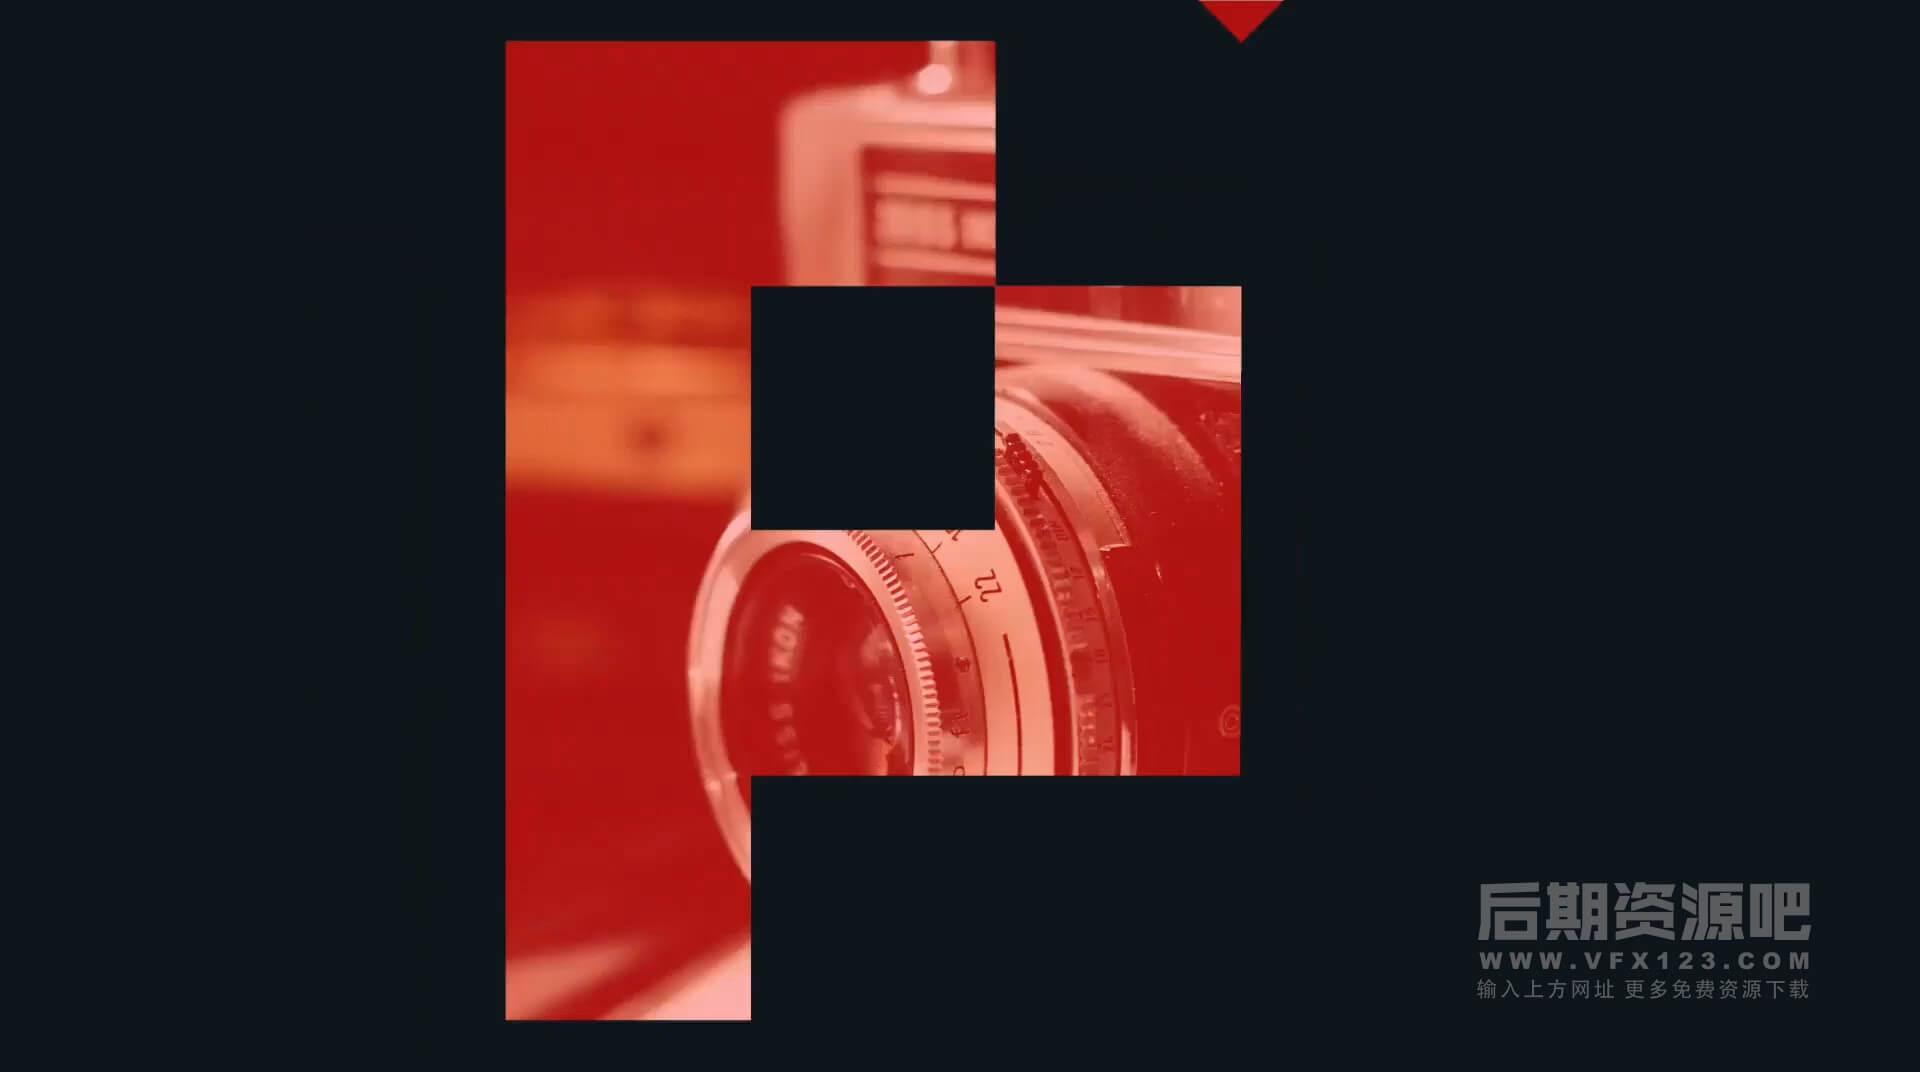 Fcpx插件 摄影工作室徽标LOGO展示模板 Photographer Logo